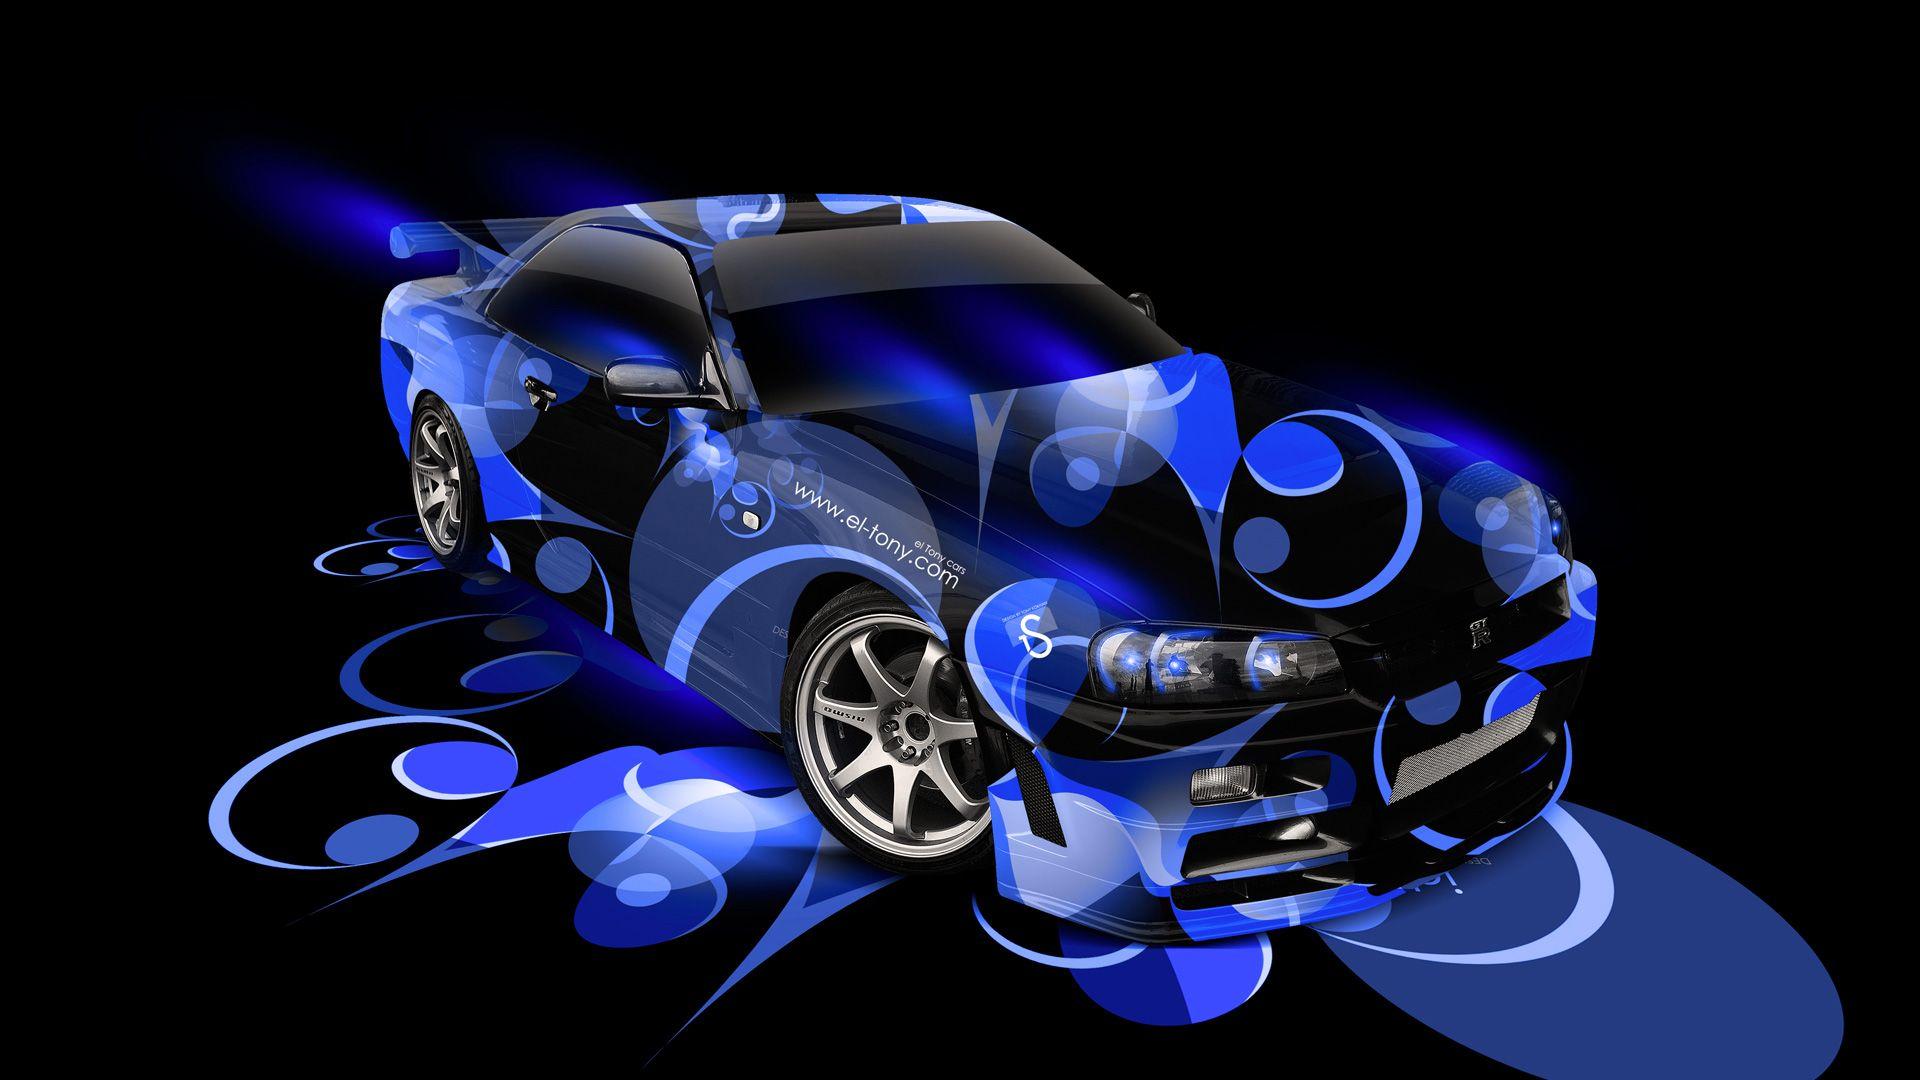 Charmant Nissan GTR R34 Super Abstract Car 2014 Blue